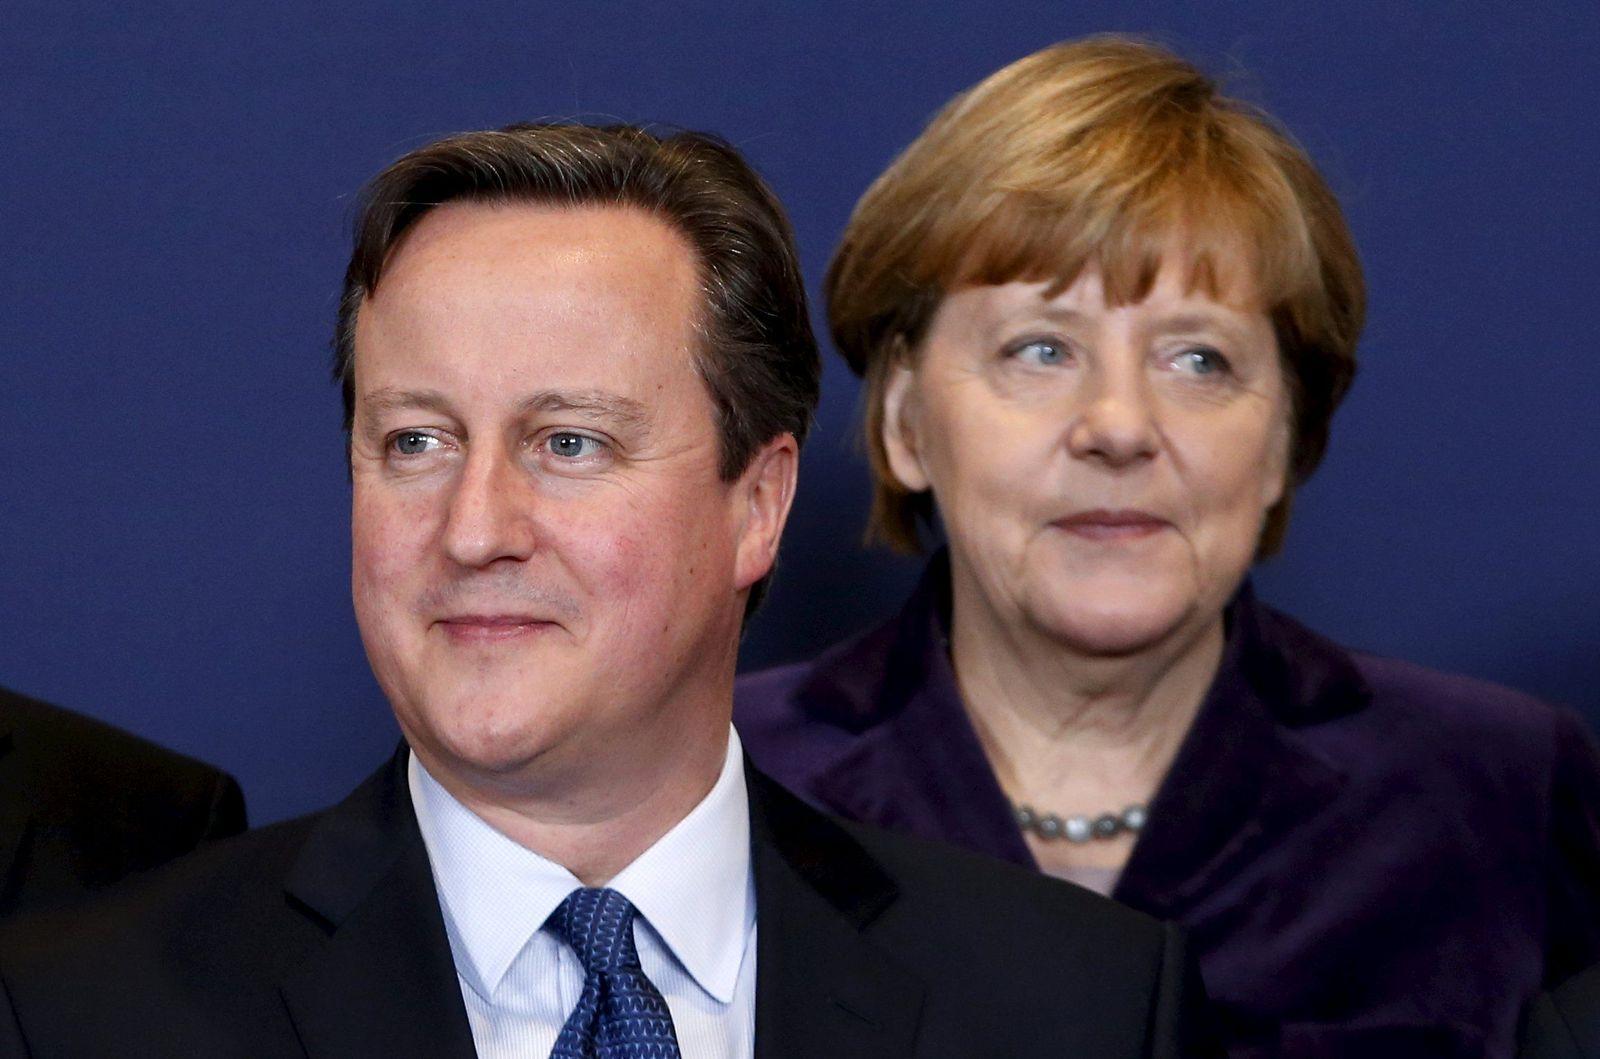 David Cameron / Angela Merkel